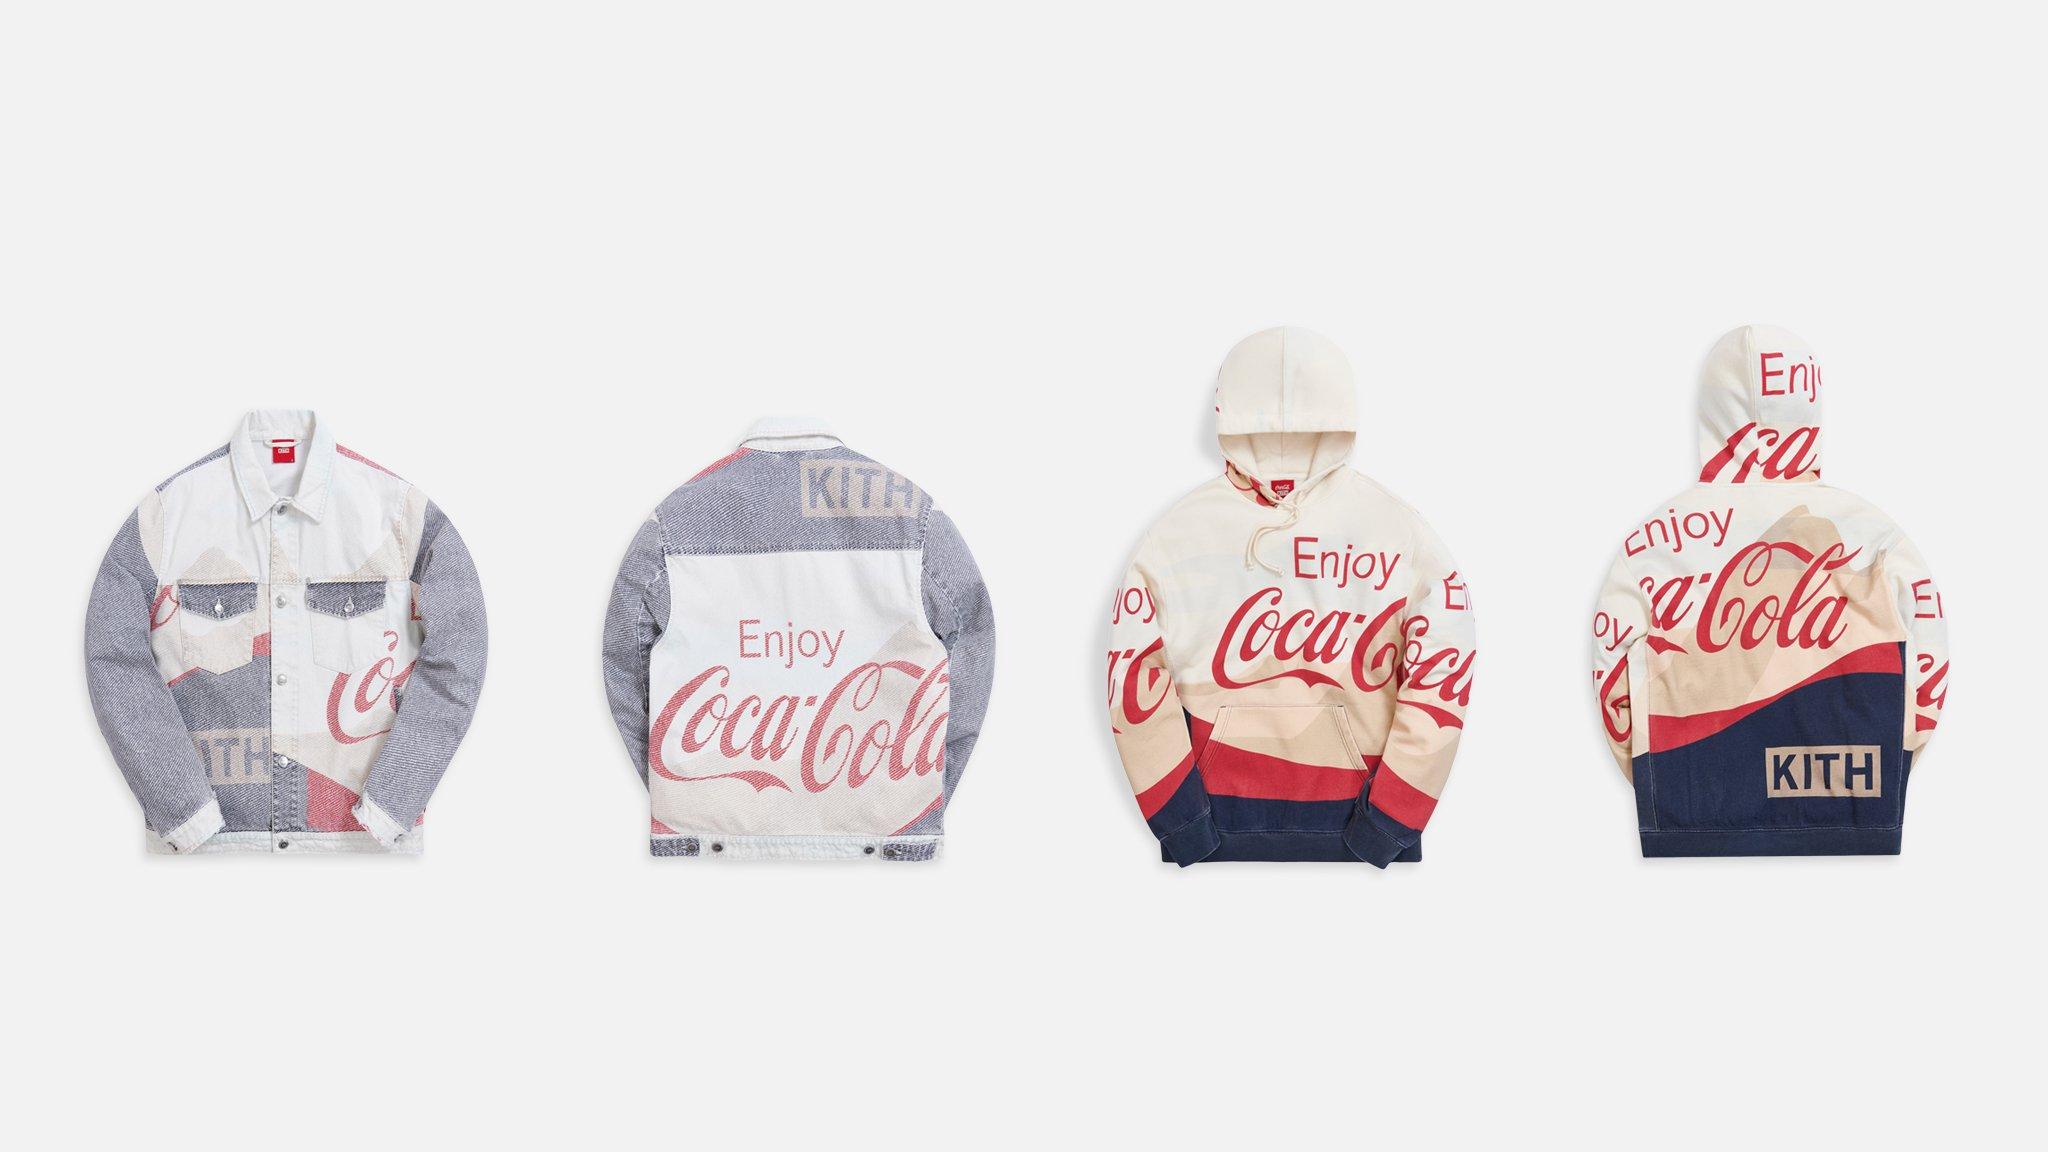 kith-coca-cola-dtf-magazine-6